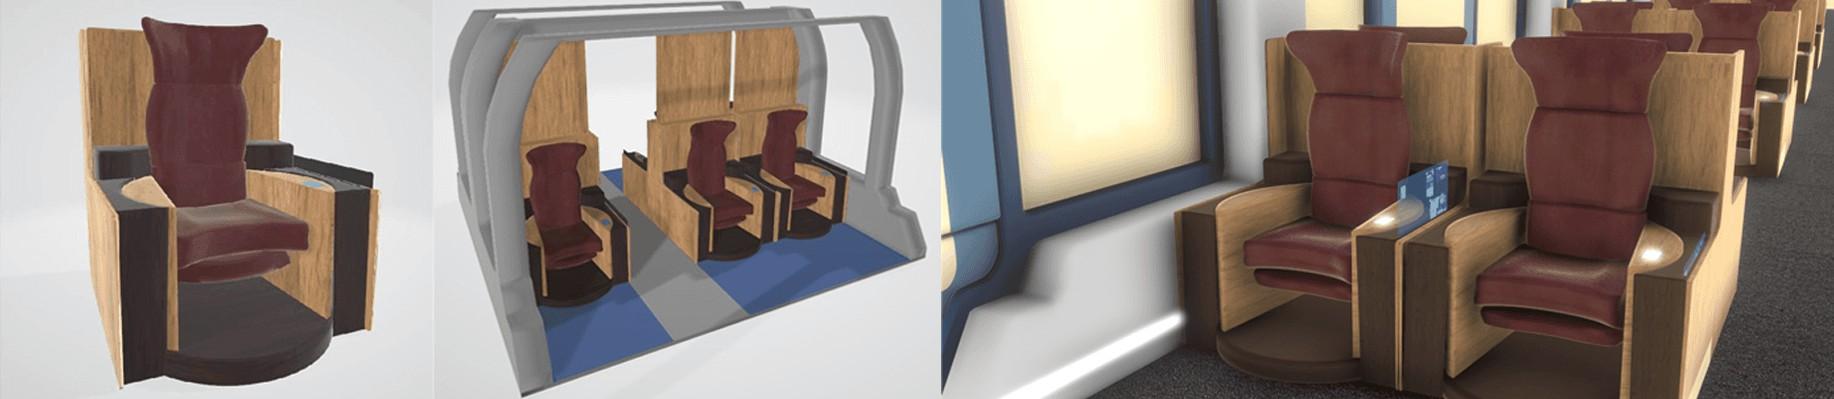 livemediagroup-virtual-reality-future-train